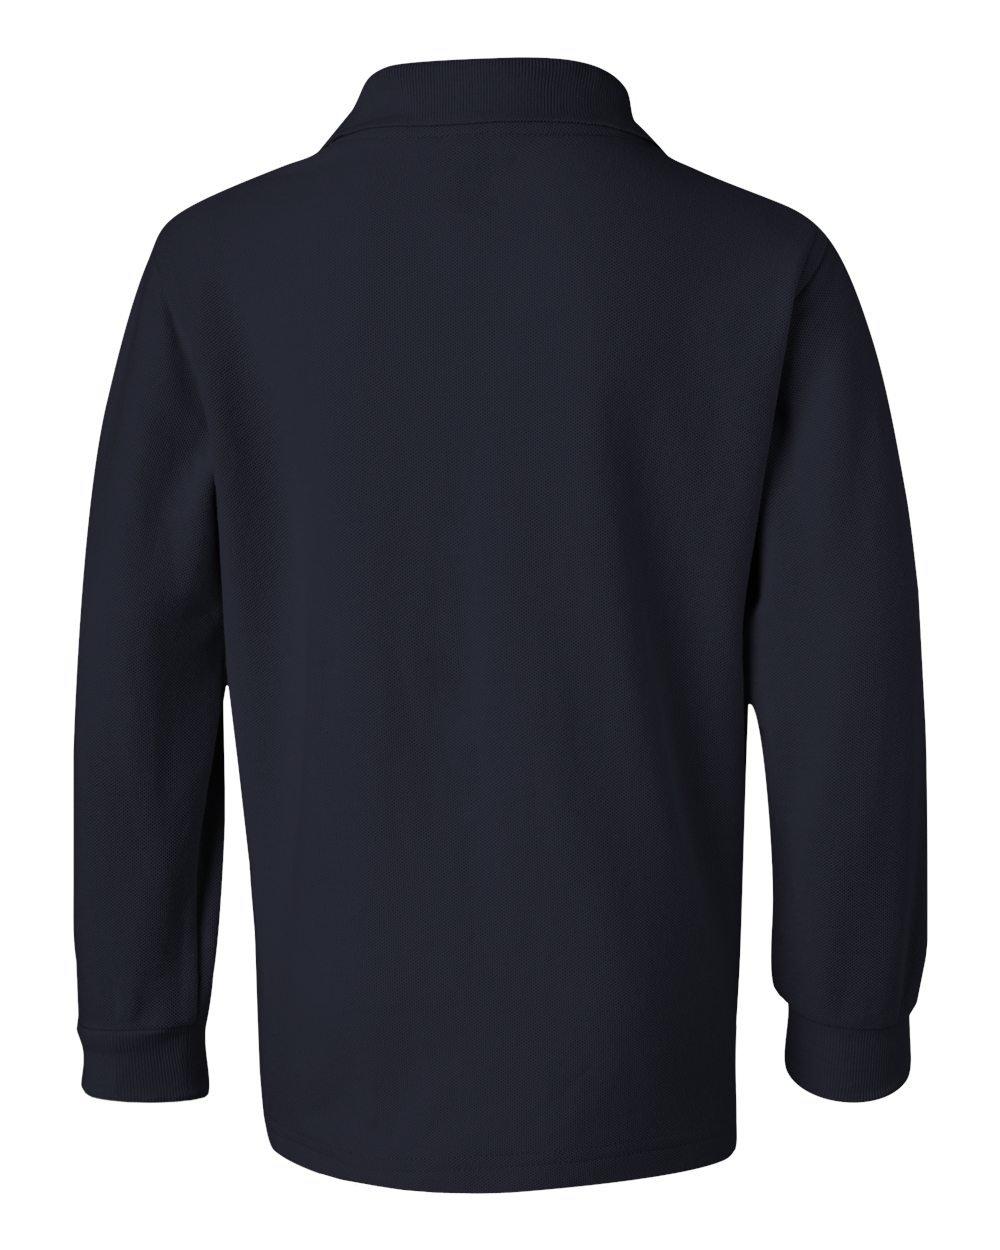 French Toast School Uniform Boys Long Sleeve Pique Polo Shirt, Navy, Medium (8)